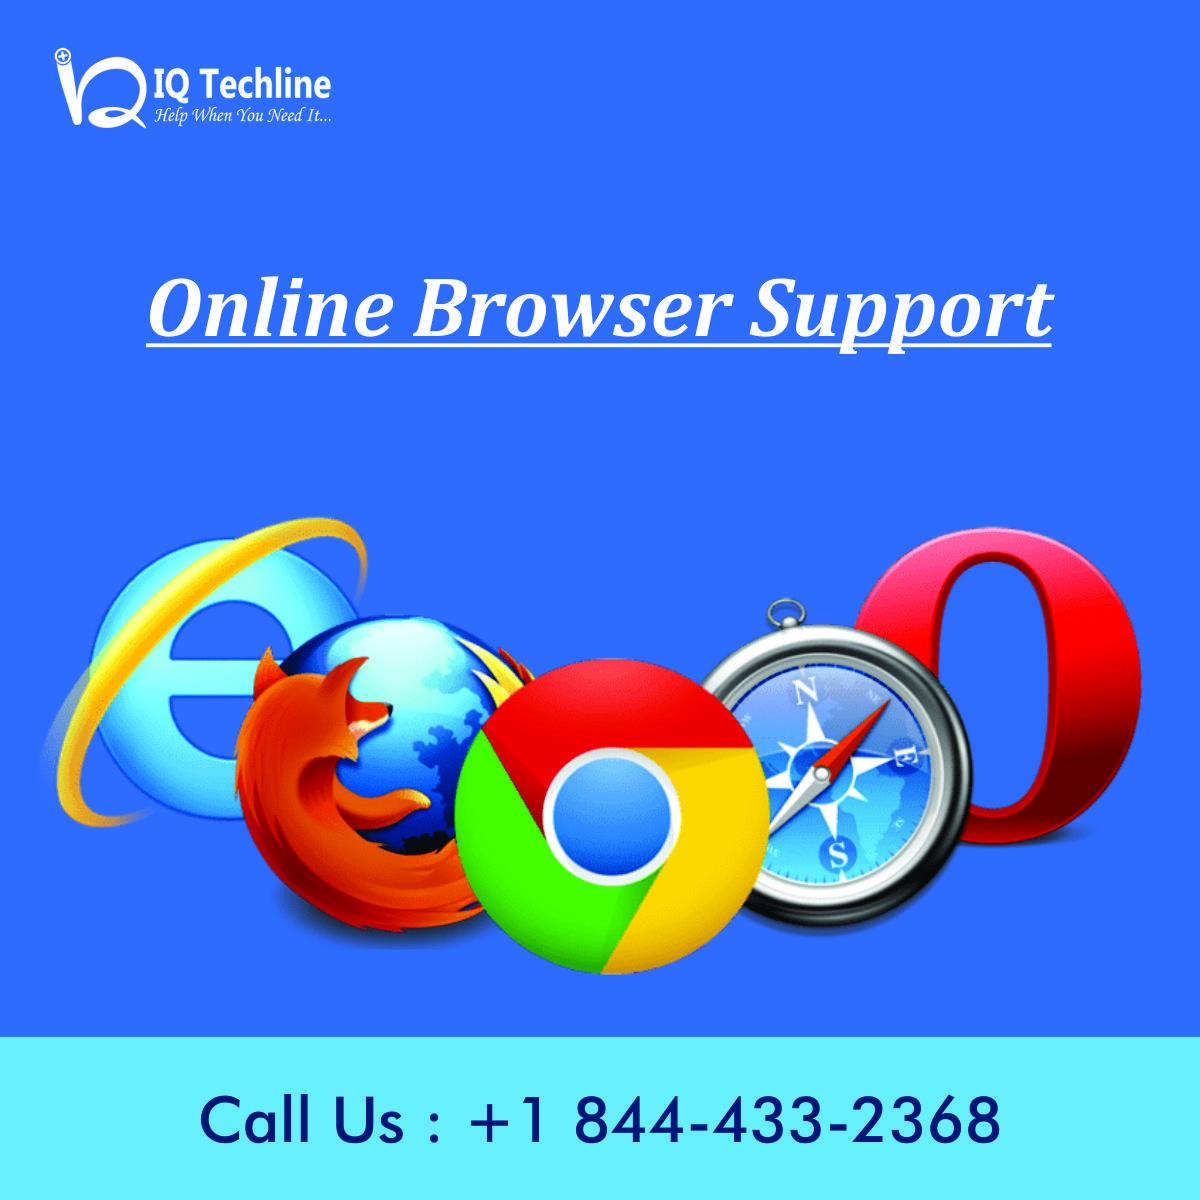 Online Browser Support Browser support, Browser, Support